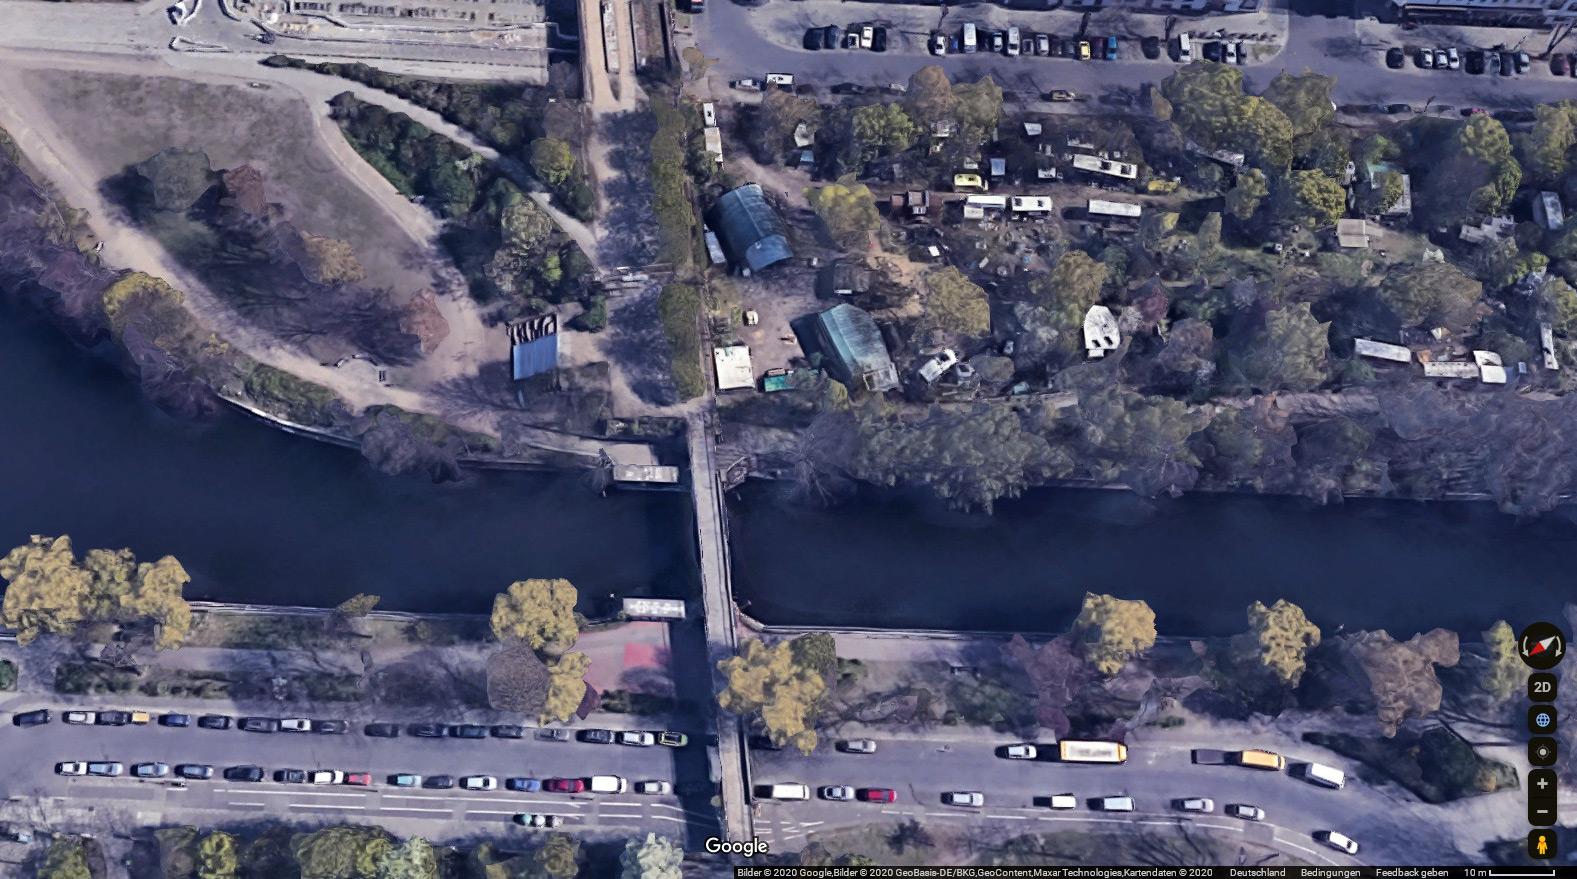 Eisenbahnbrücke über den Landwehrkanal - Google Maps